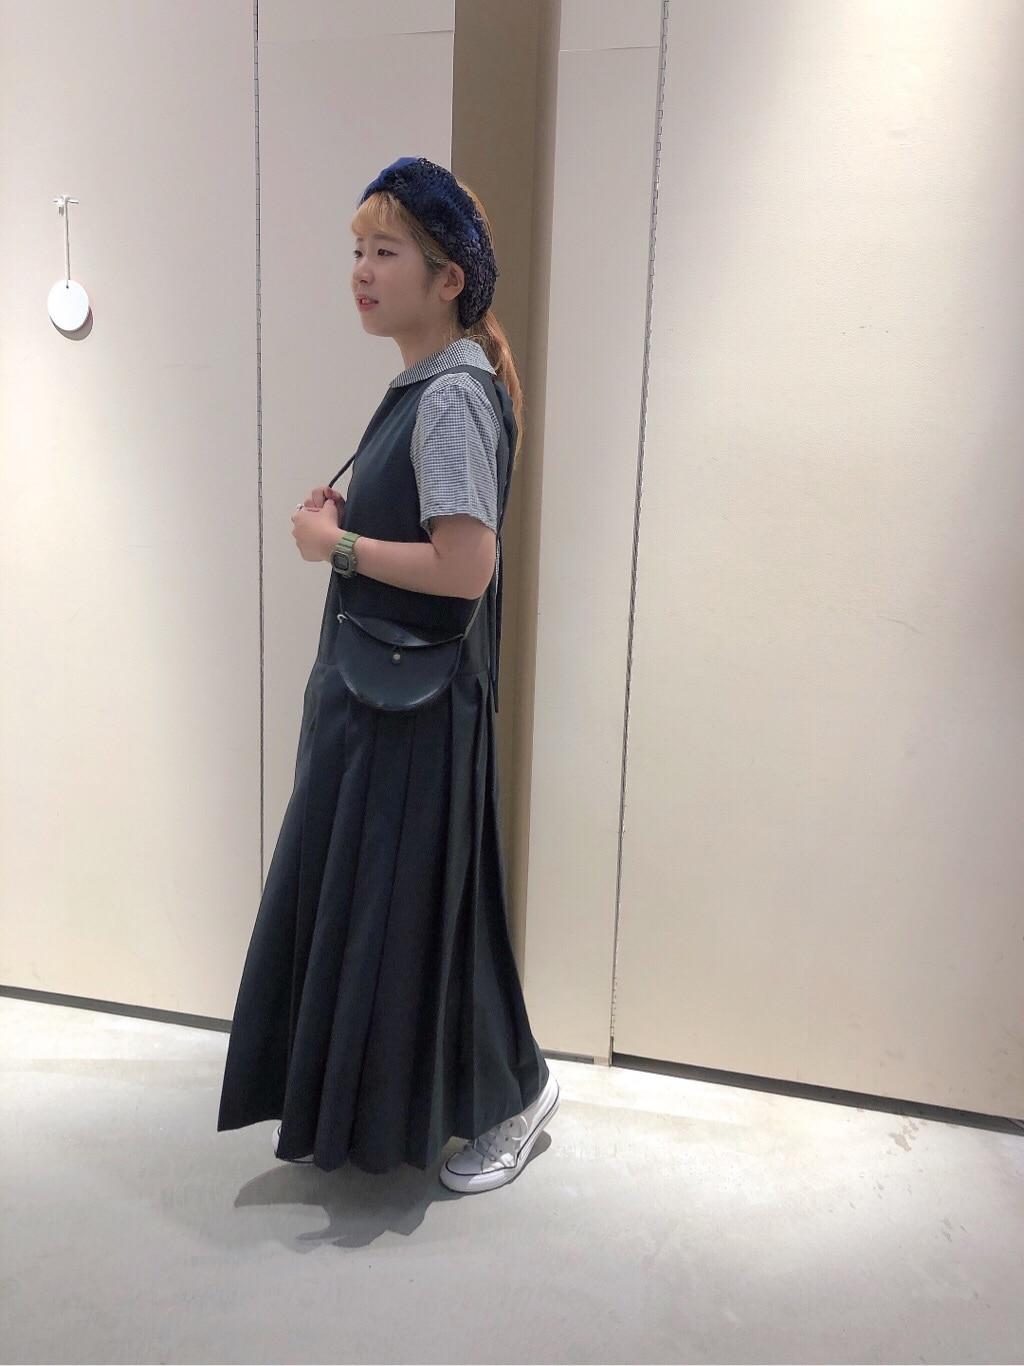 bulle de savon 阪急西宮ガーデンズ 身長:152cm 2019.08.08